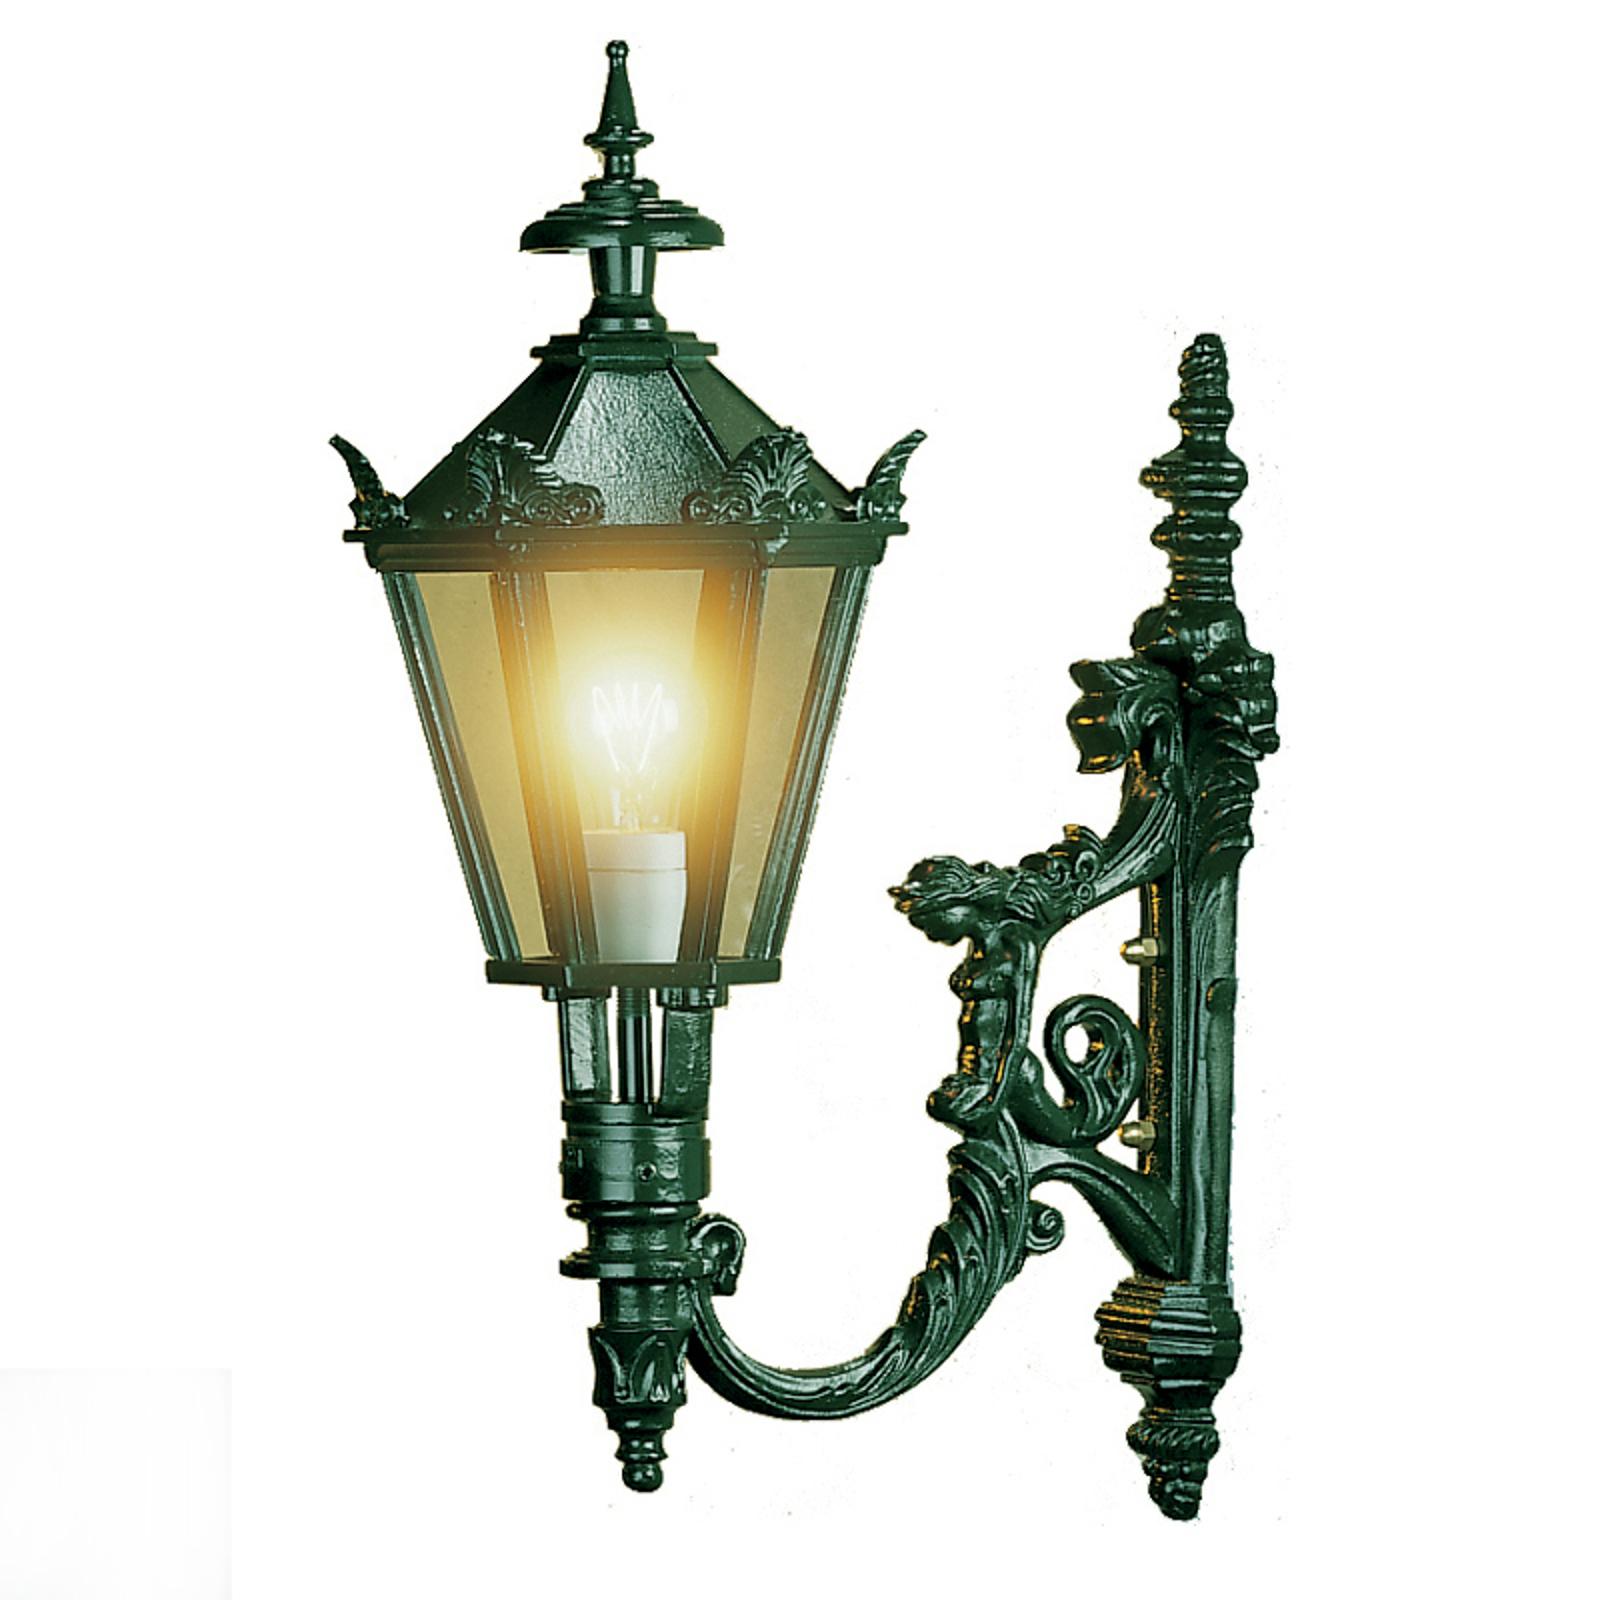 Buitenwandlamp Diana, groen